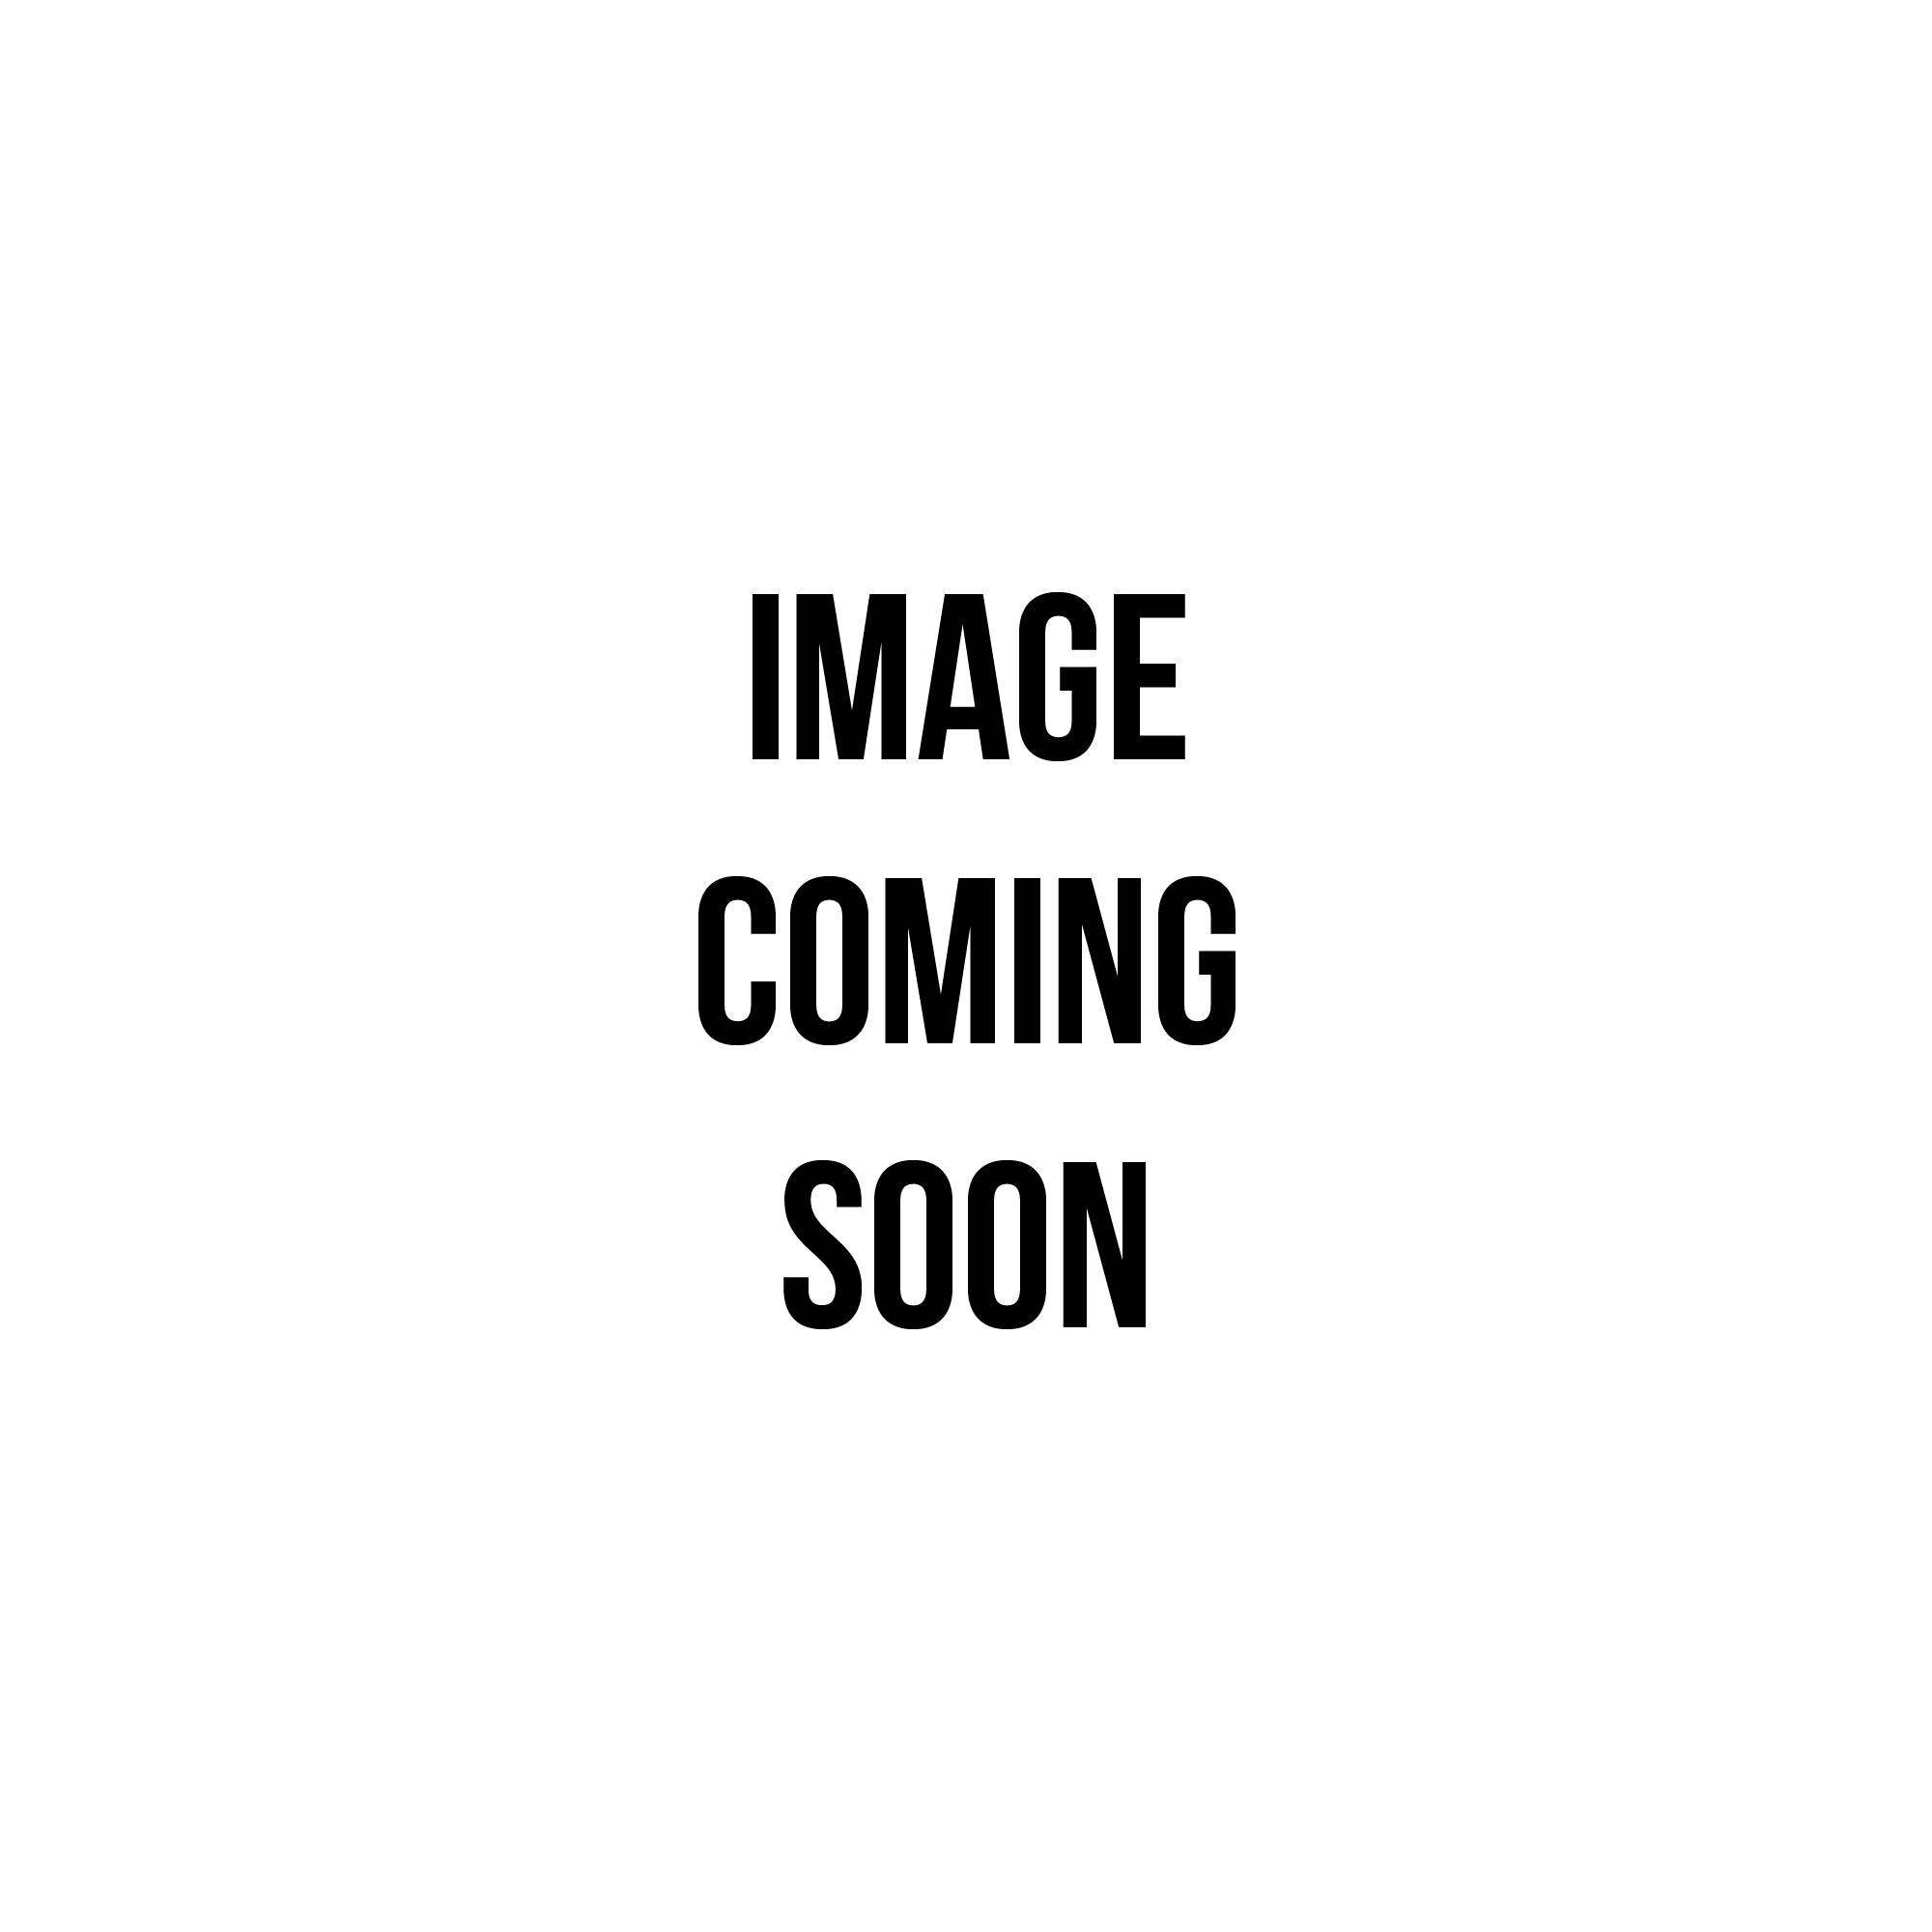 pas cher populaire Orange 100% Original Run Nike Roshe Femmes Chaussures Blanc Logo Noir Transparent Footaction rabais oMFl8